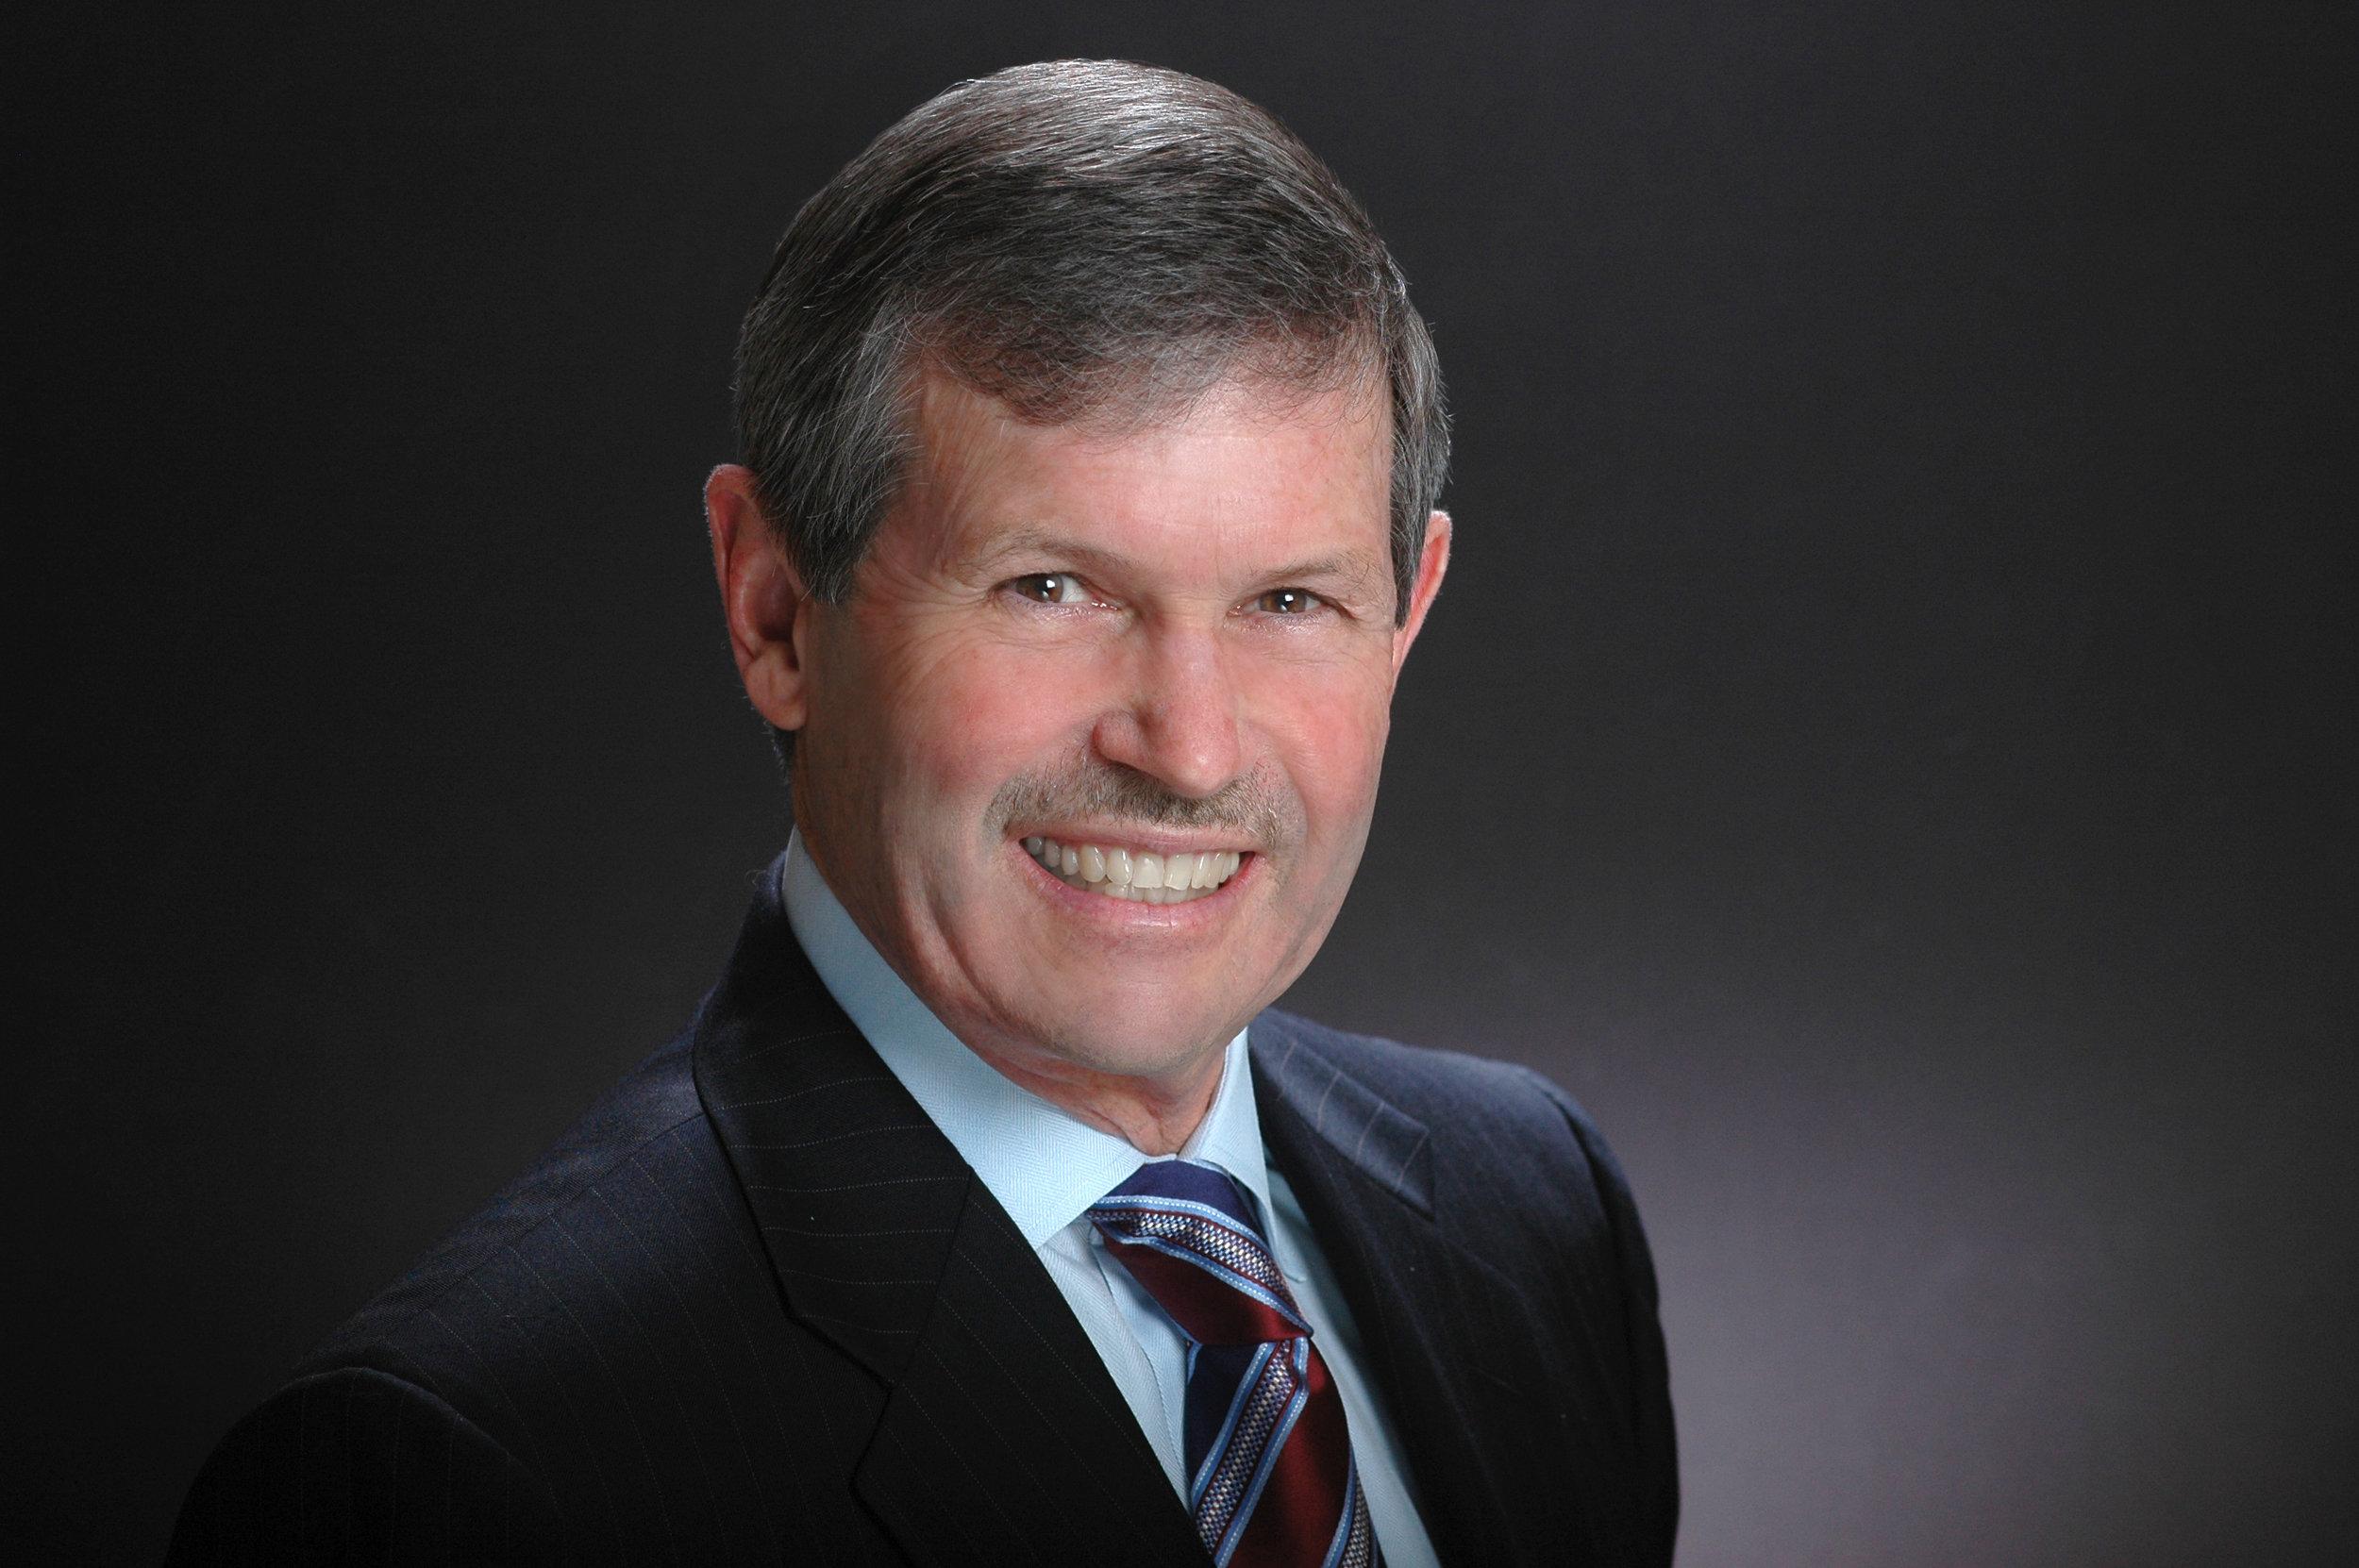 Jim Goodrich, MAI, SRA, CCIM, Senior Property Tax Consultant